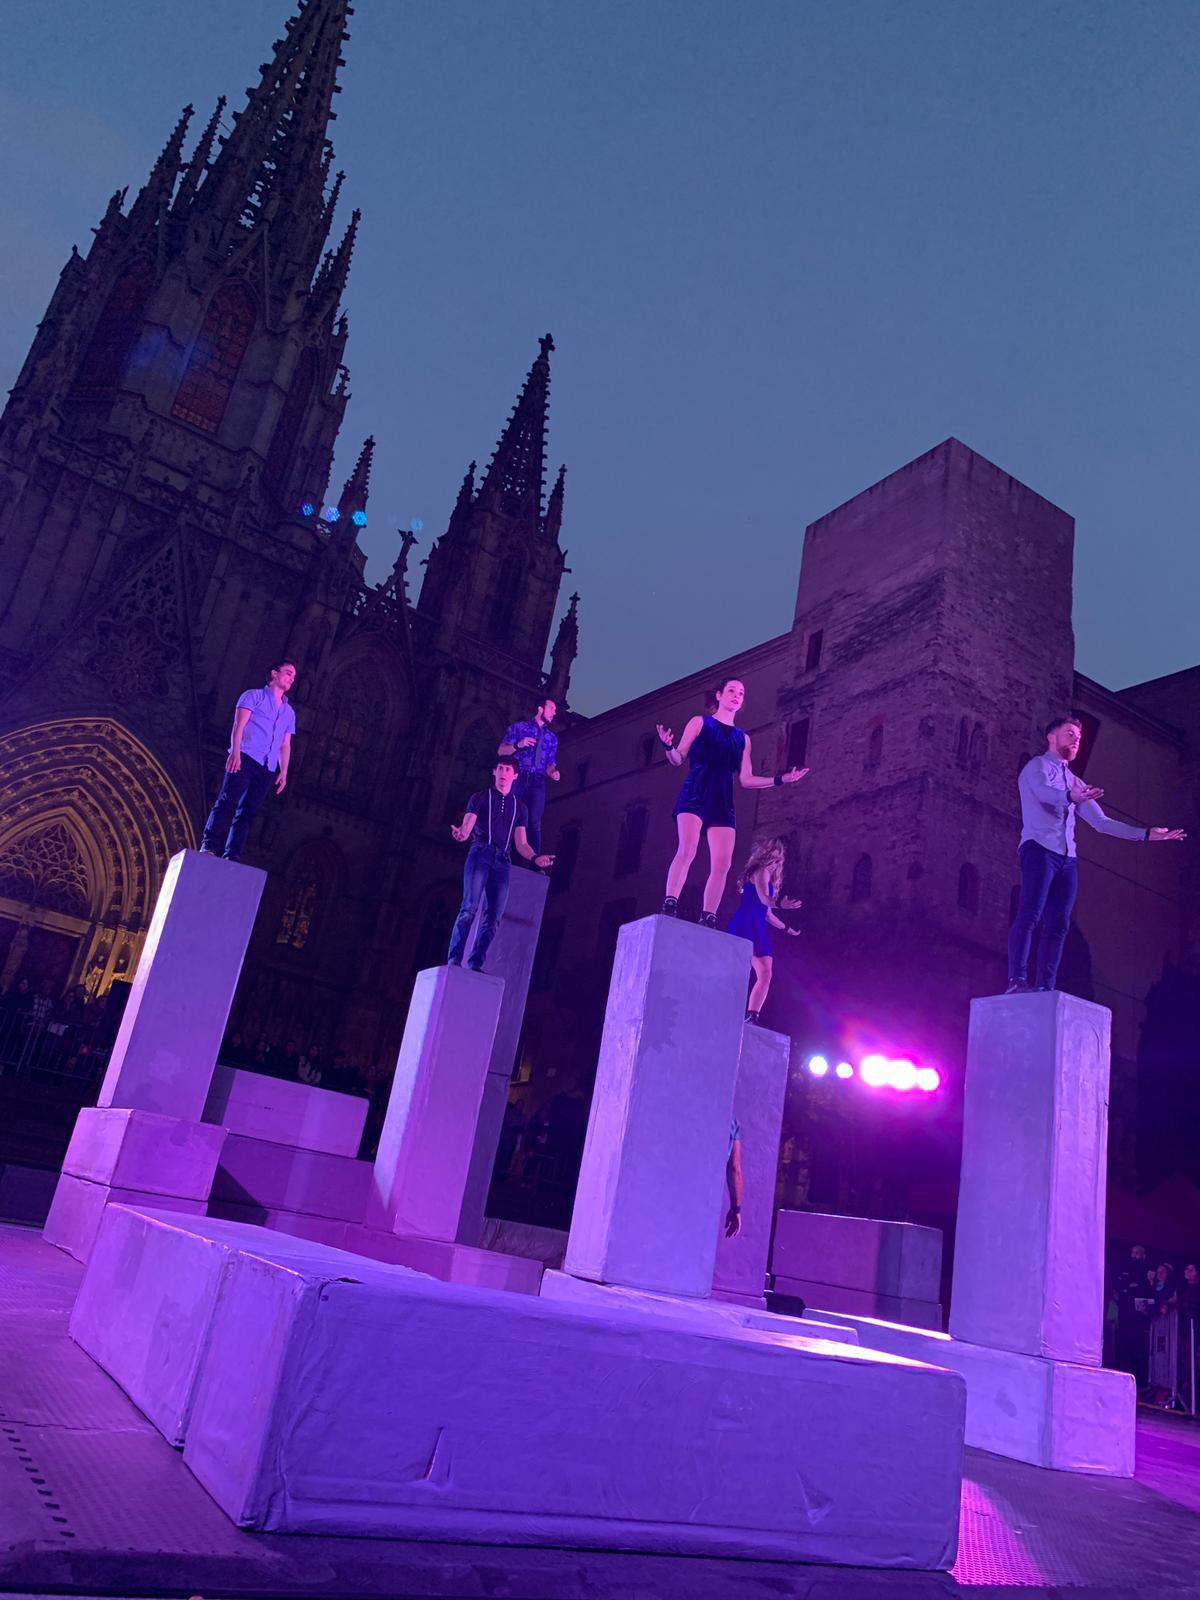 BLOCK dancers standing on the blocks